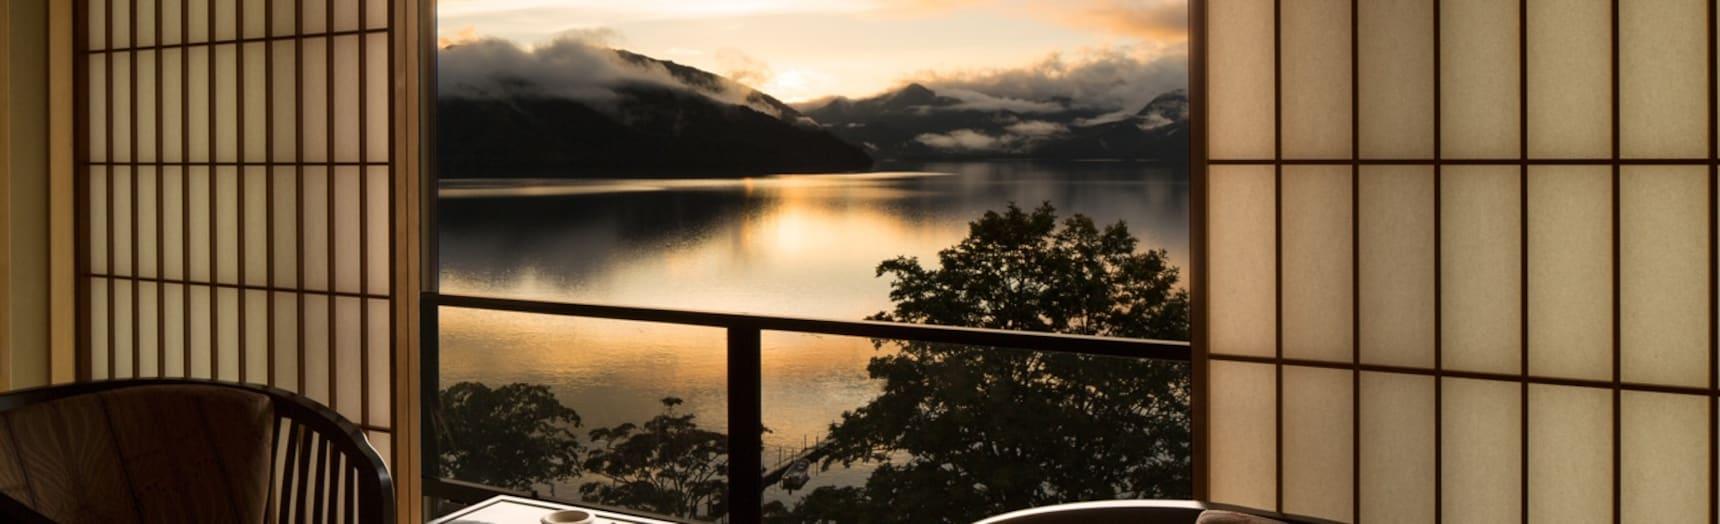 5 Dreamy Hotels in Nikko